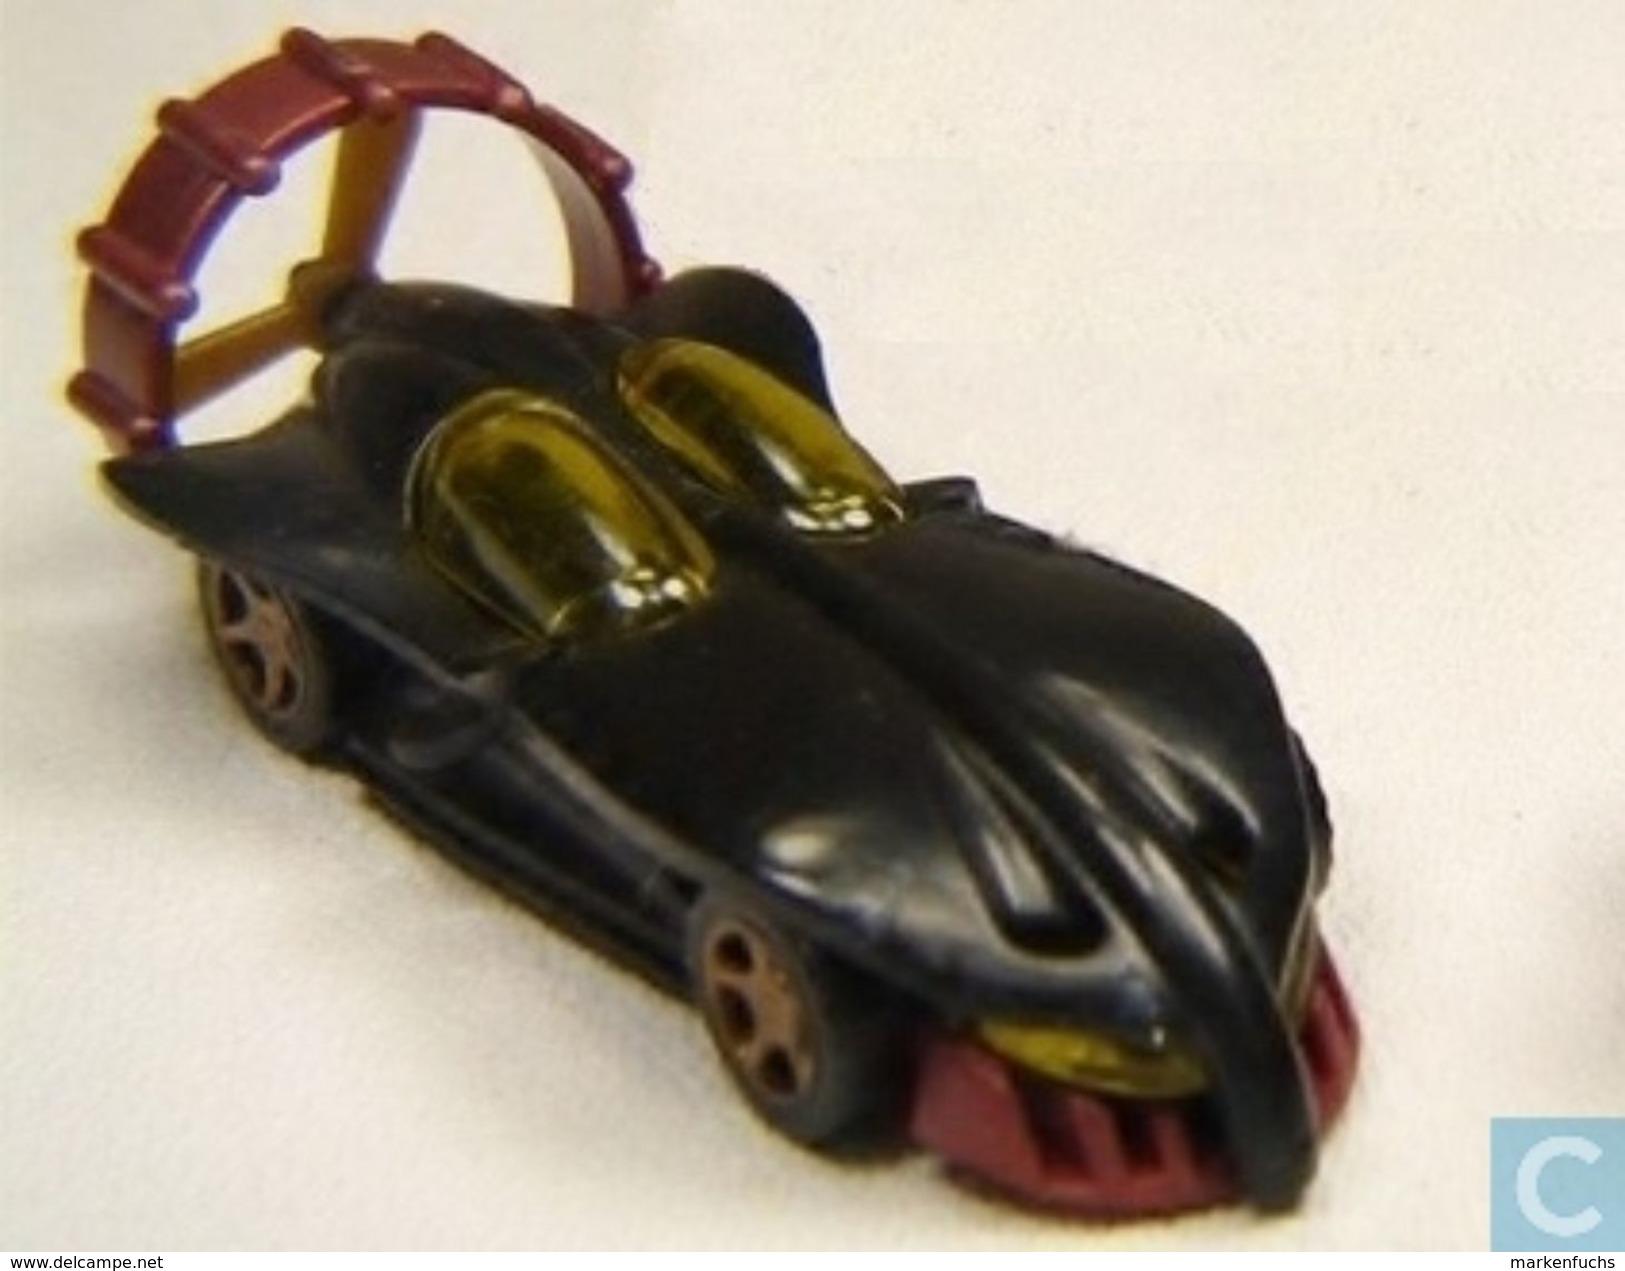 Supermobile 1998 / Rocket - Ü-Ei